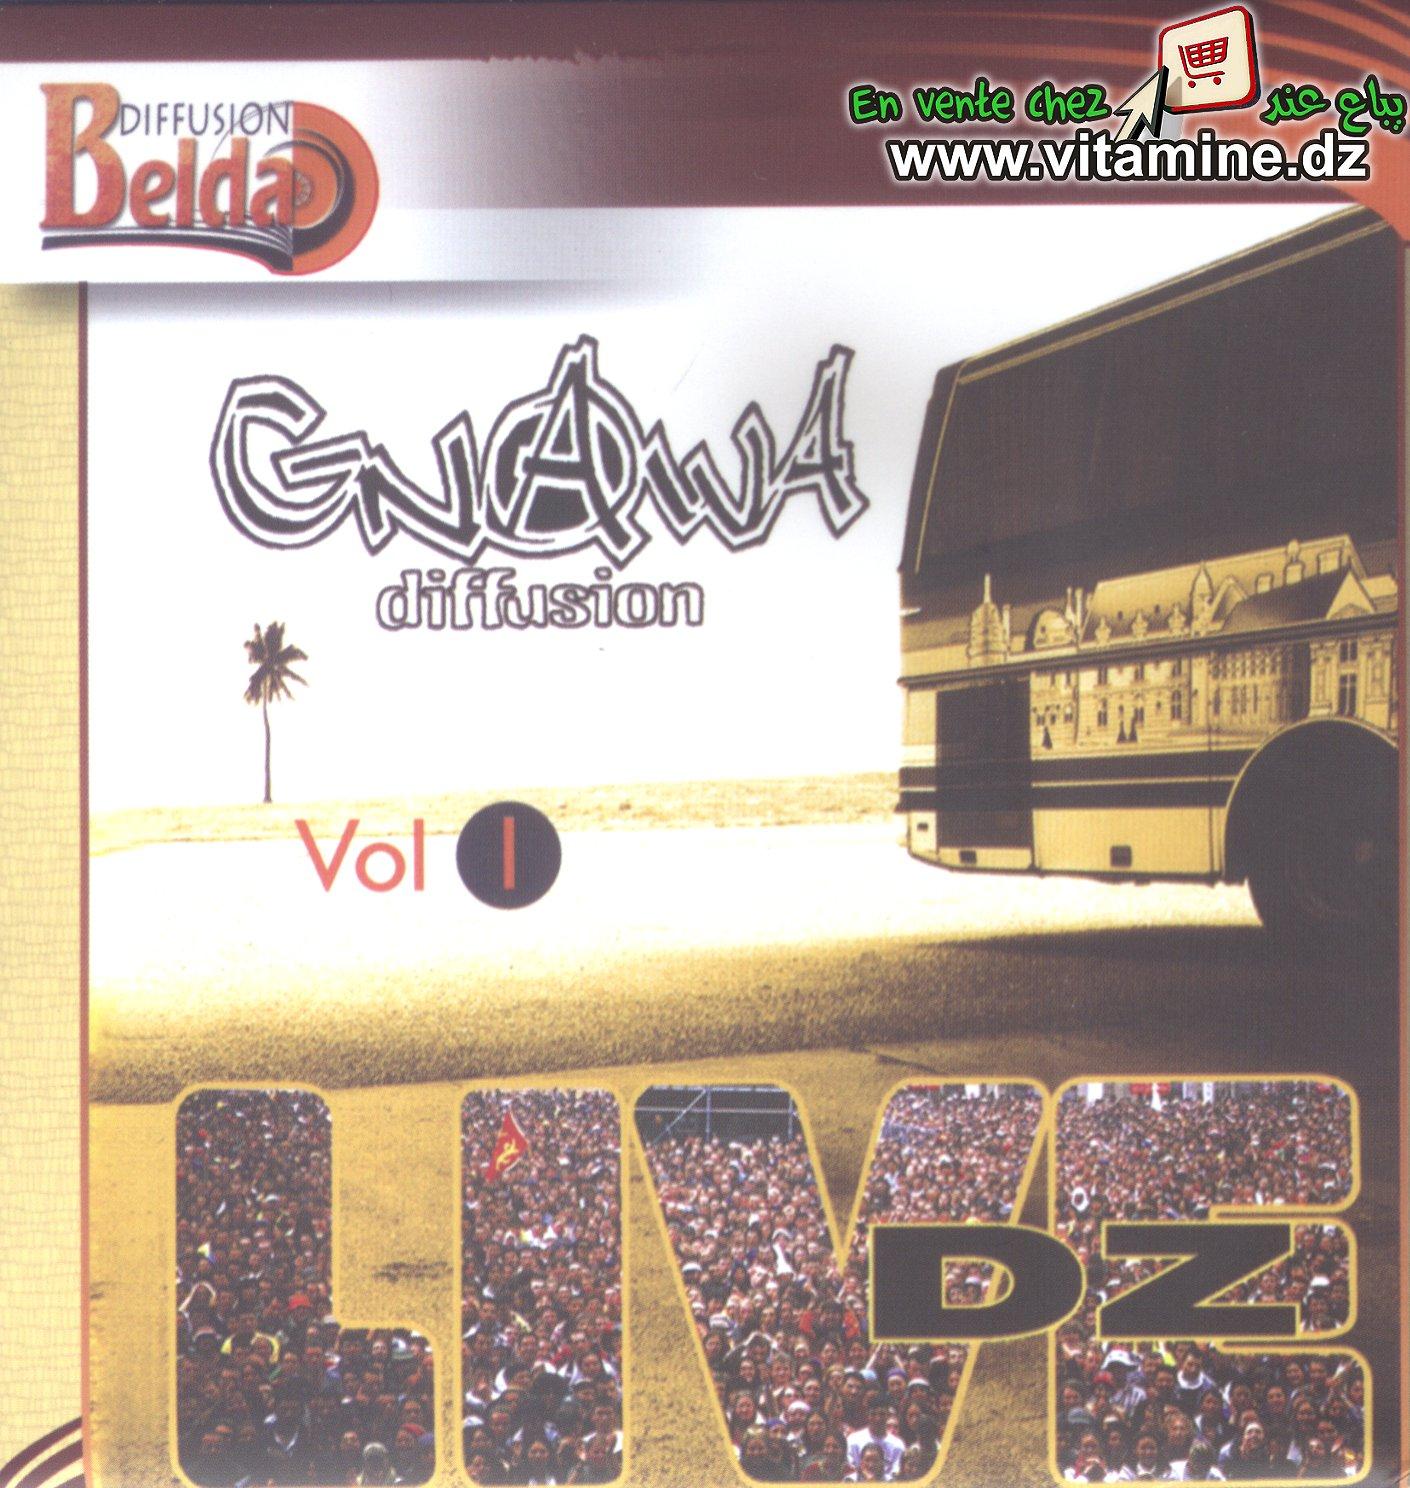 Gnawa diffusion live dz vol 1